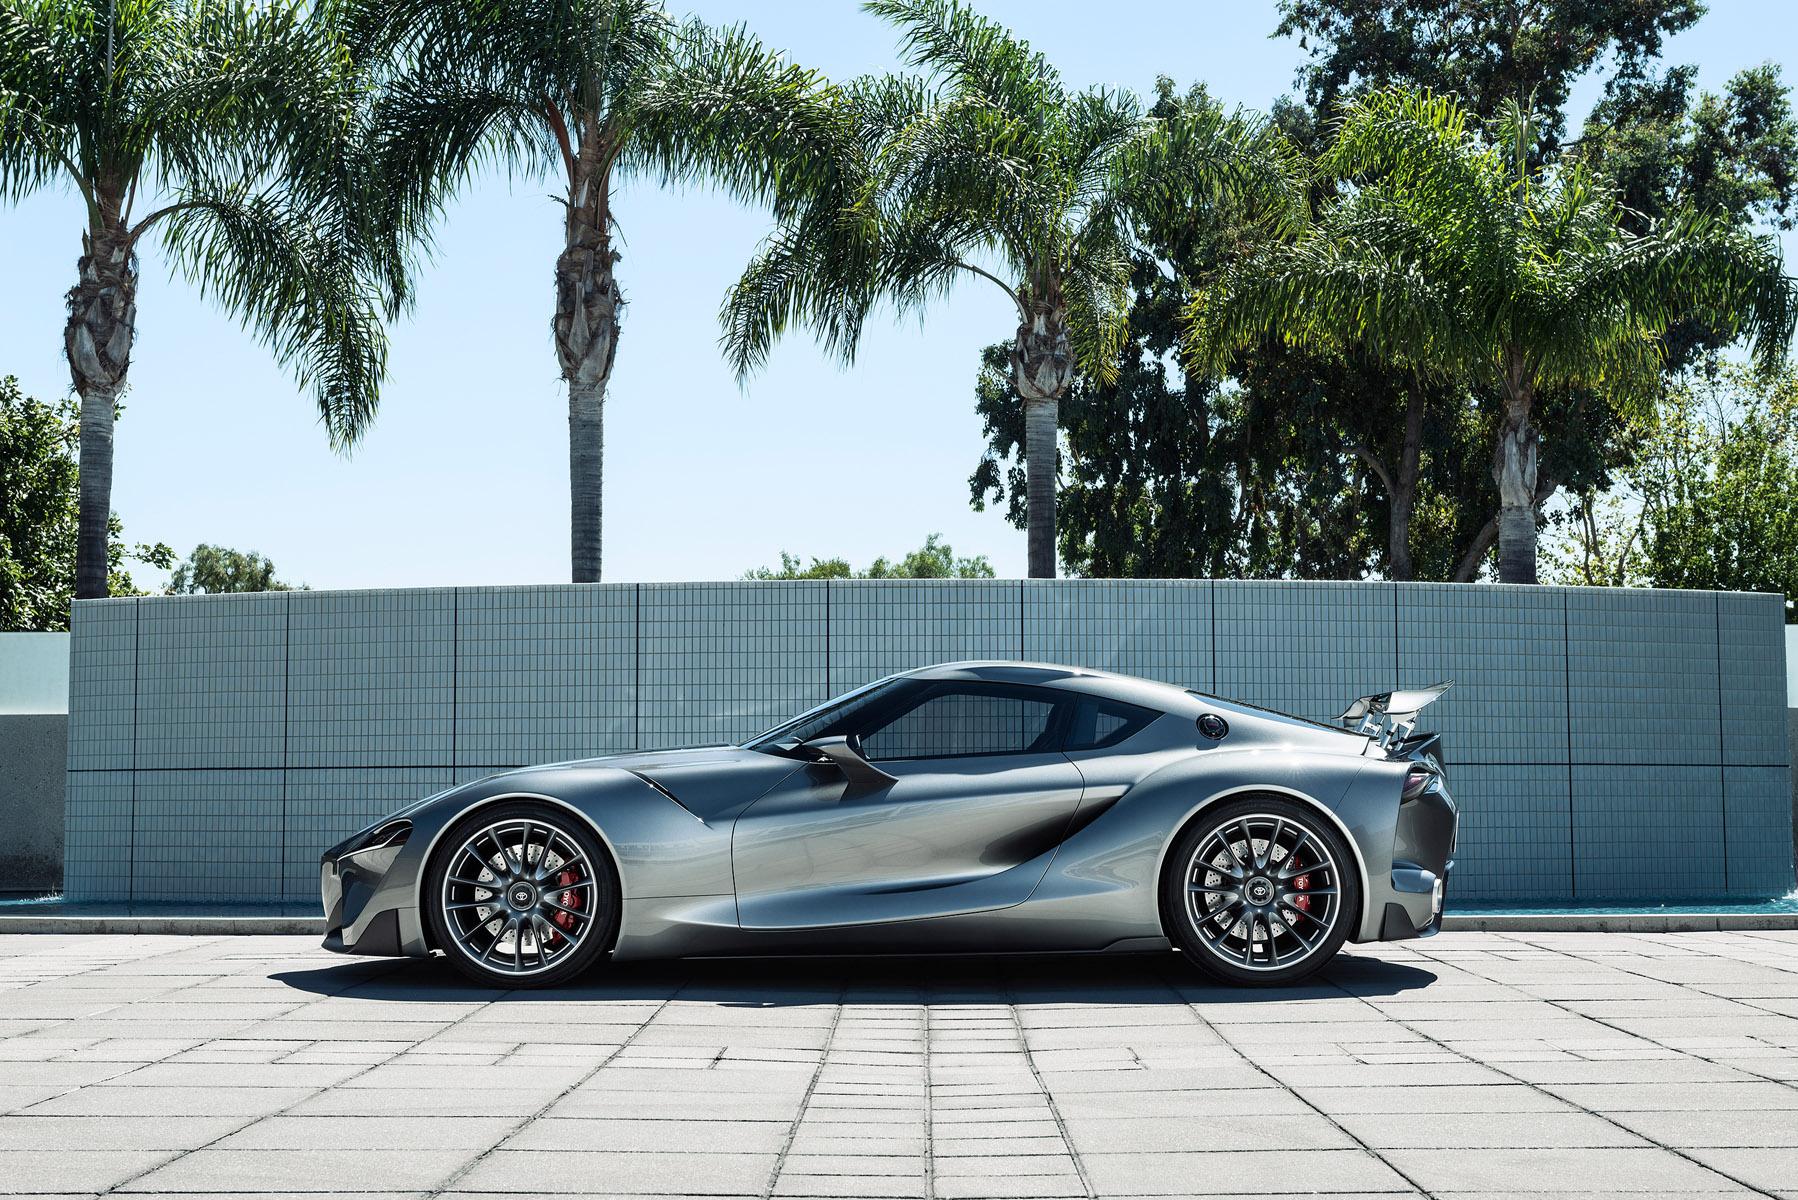 2014 Toyota FT-1 Graphite Concept